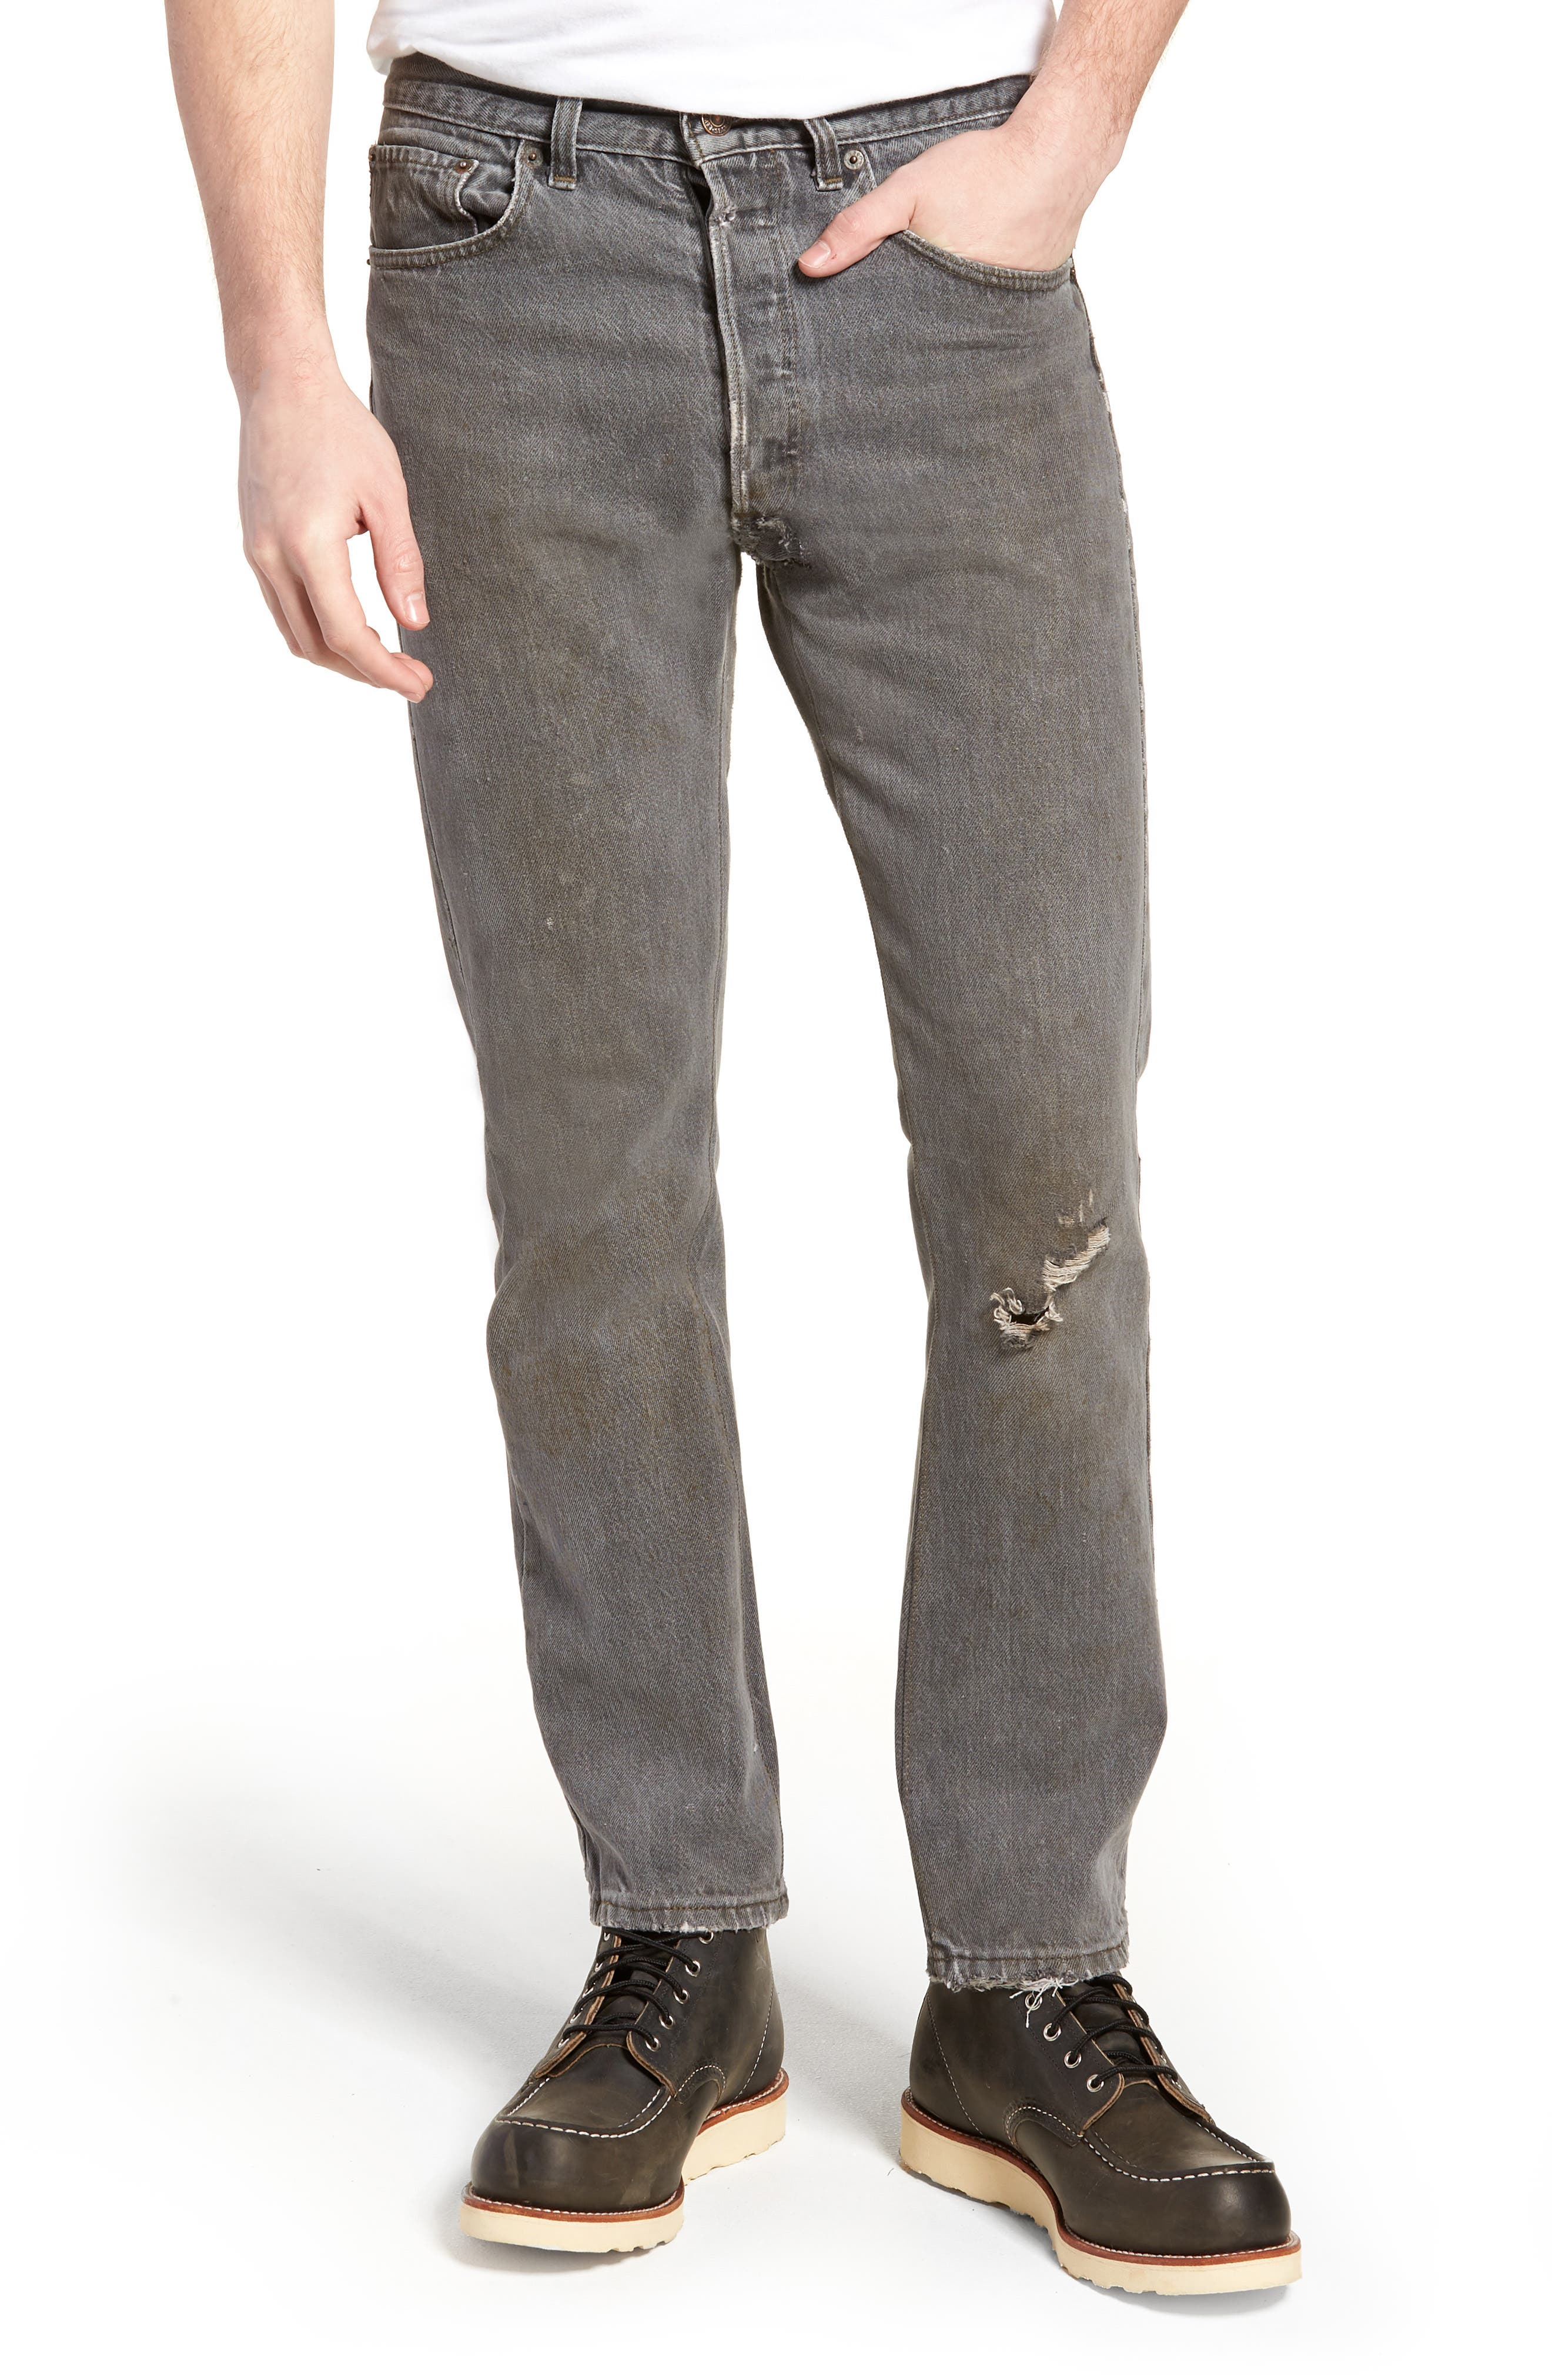 Levi's® Authorized Vintage 501™ Tapered Slim Fit Jeans (AV Black)